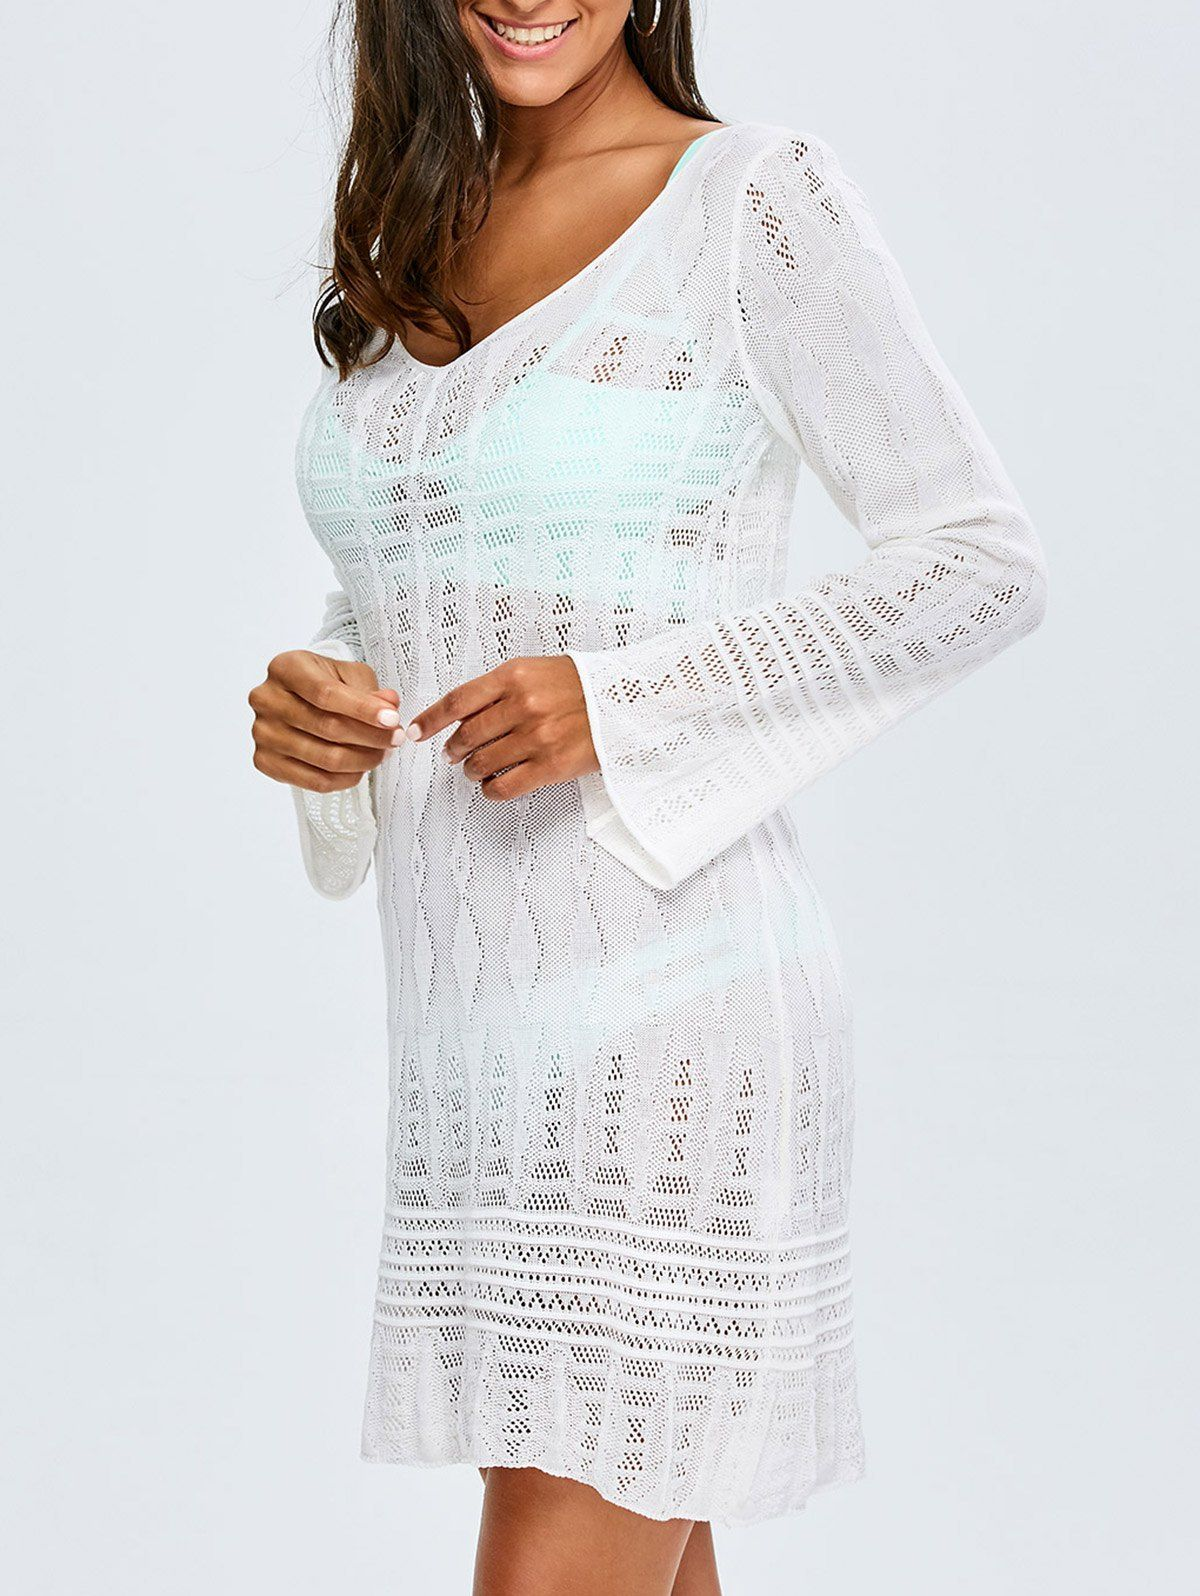 Long Sleeve Crochet Cover Up White Cover Ups Zaful Beach Coverup Dress Beach White Dress Dresses For Sale [ 1596 x 1200 Pixel ]